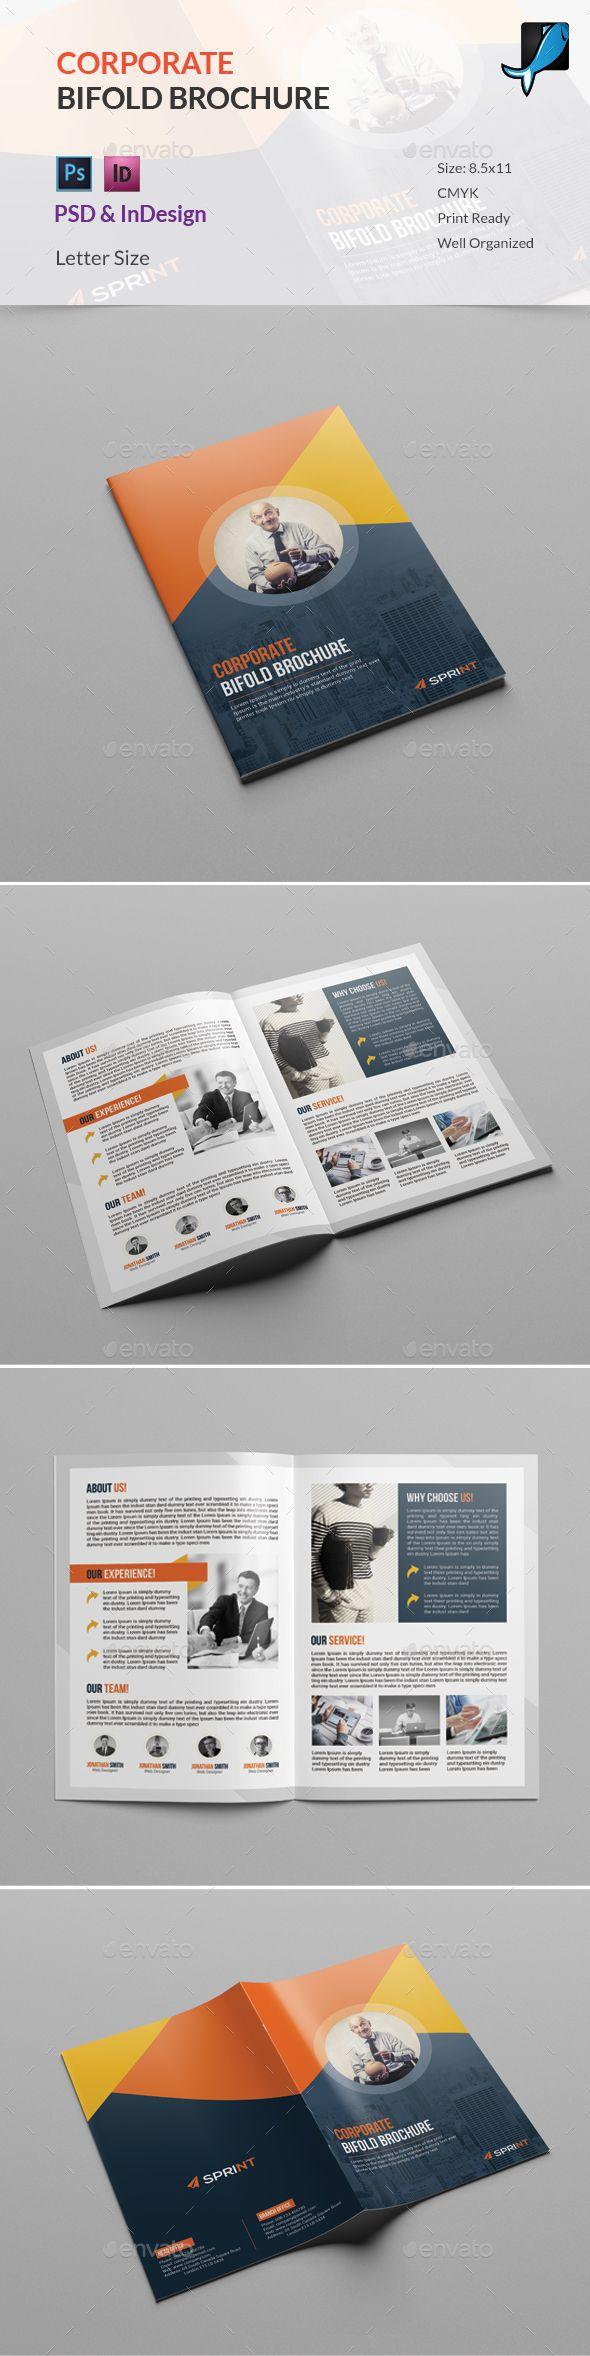 Corporate Bifold Brochure | Pinterest | Editorial, Diseño editorial ...